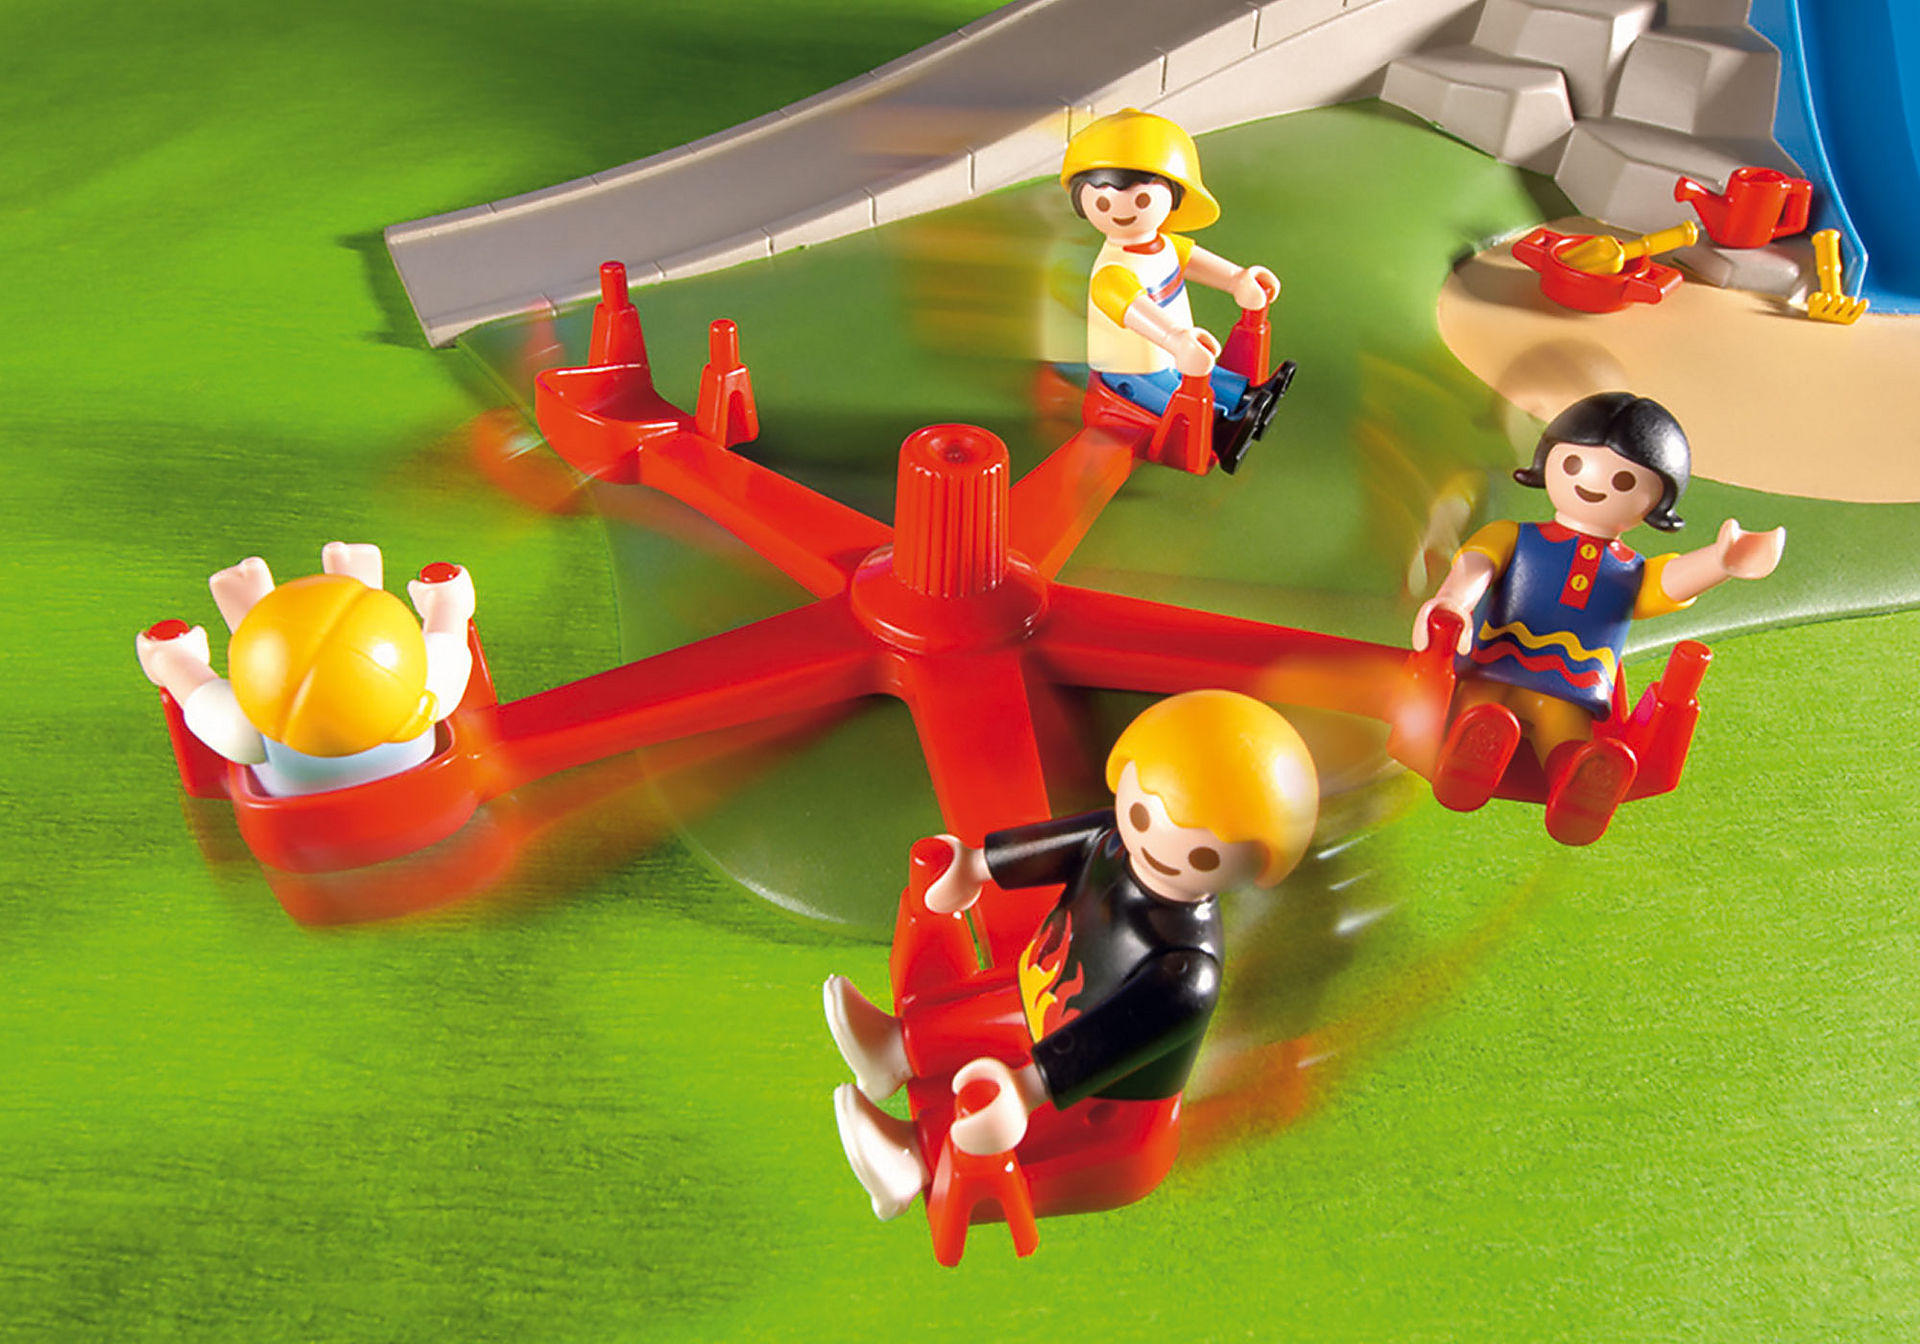 http://media.playmobil.com/i/playmobil/4132_product_extra2/Superset enfant / aire de jeux